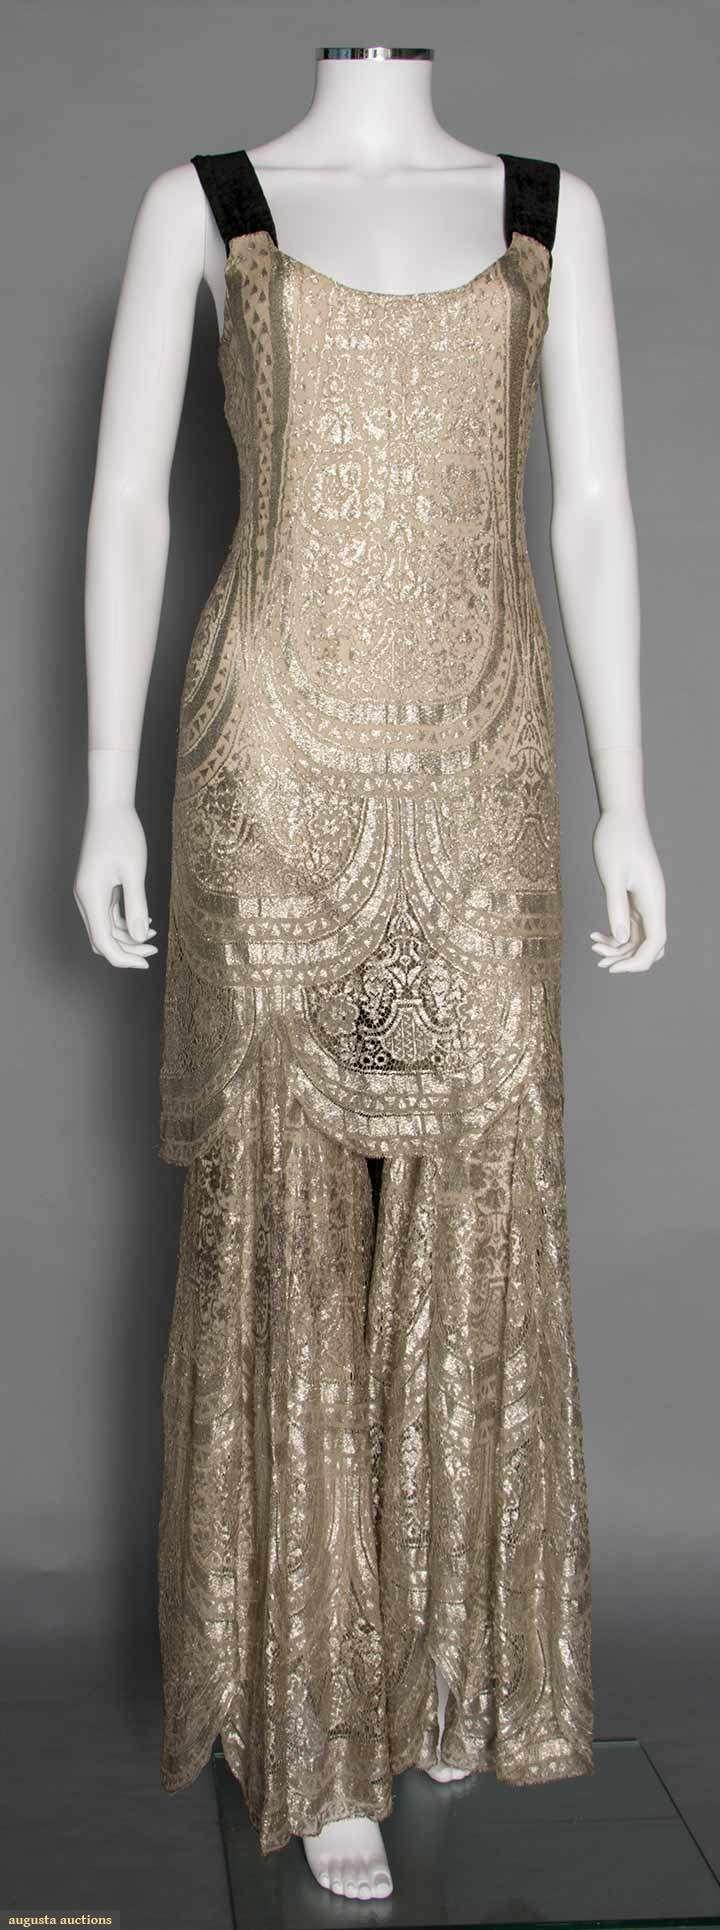 Metallic Jumpsuit w/ Bolero (image 2) | 1930s | lace, velvet | Augusta Auctions | November 12, 2014/Lot 310